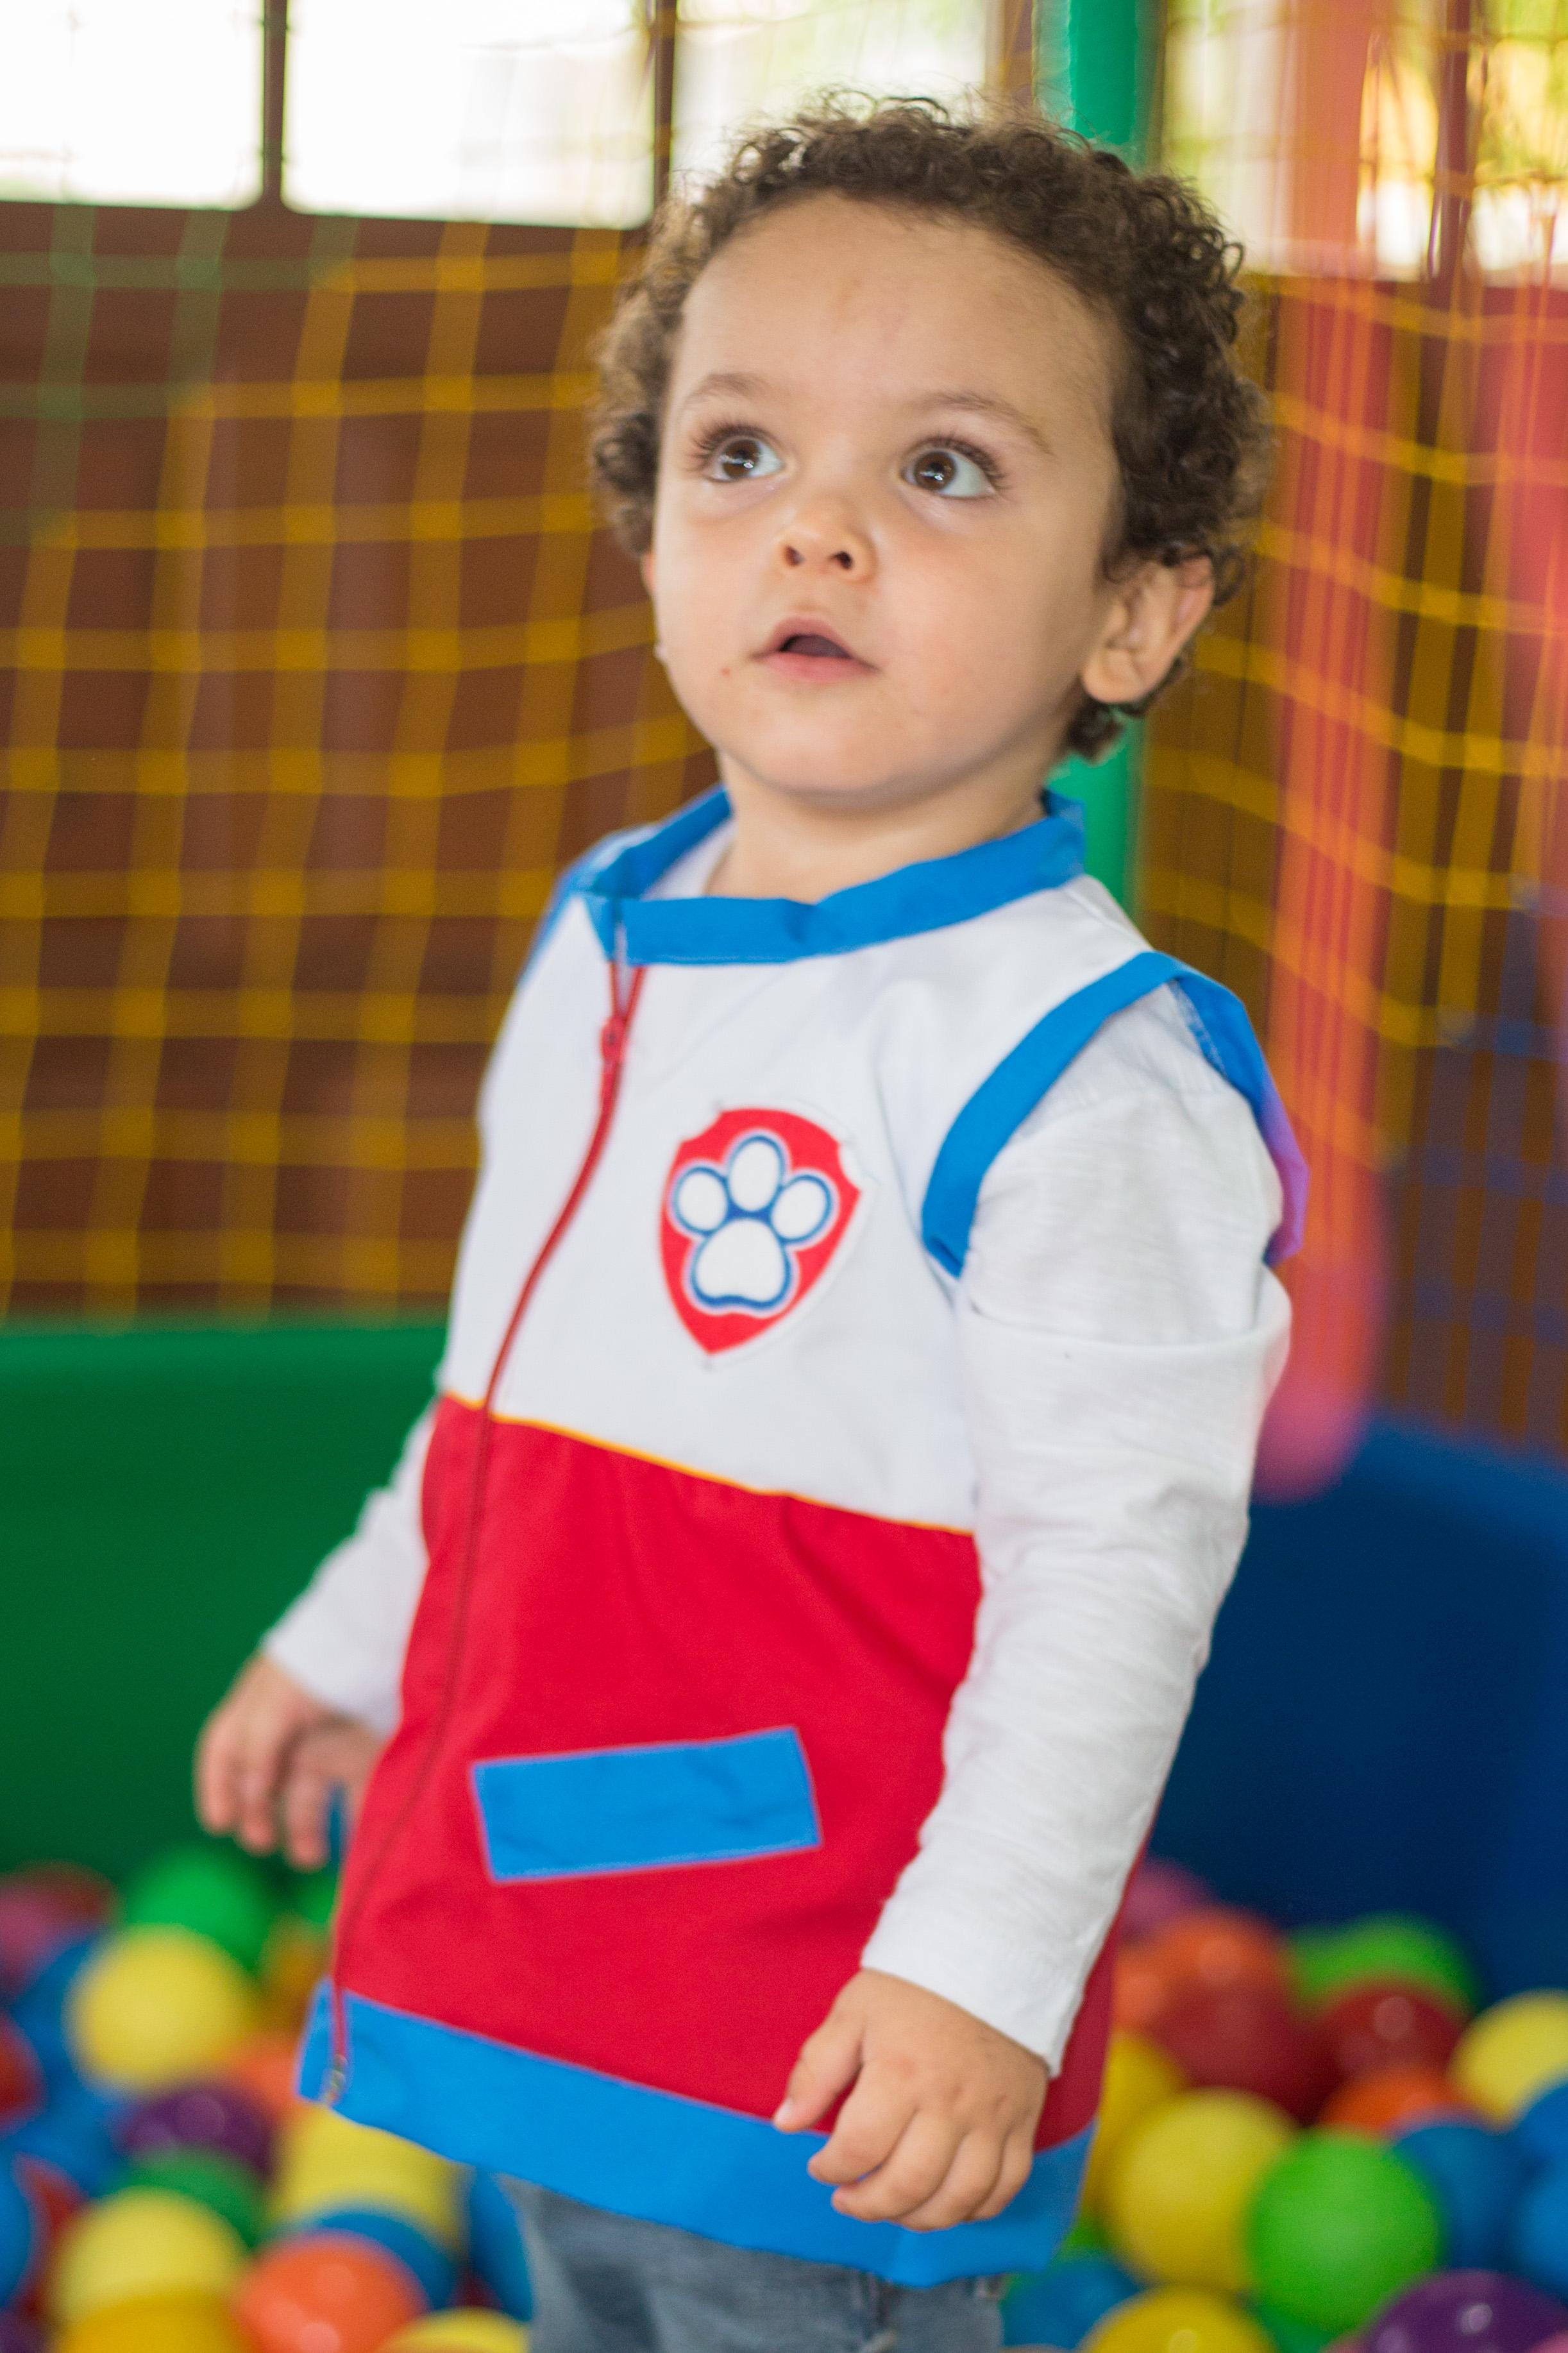 Festa‐Infantil‐Florianopolis‐Ana‐Marmo‐FotografiaFesta‐Infantil‐Florianopolis‐Ana‐Marmo‐Fotografia191A0276